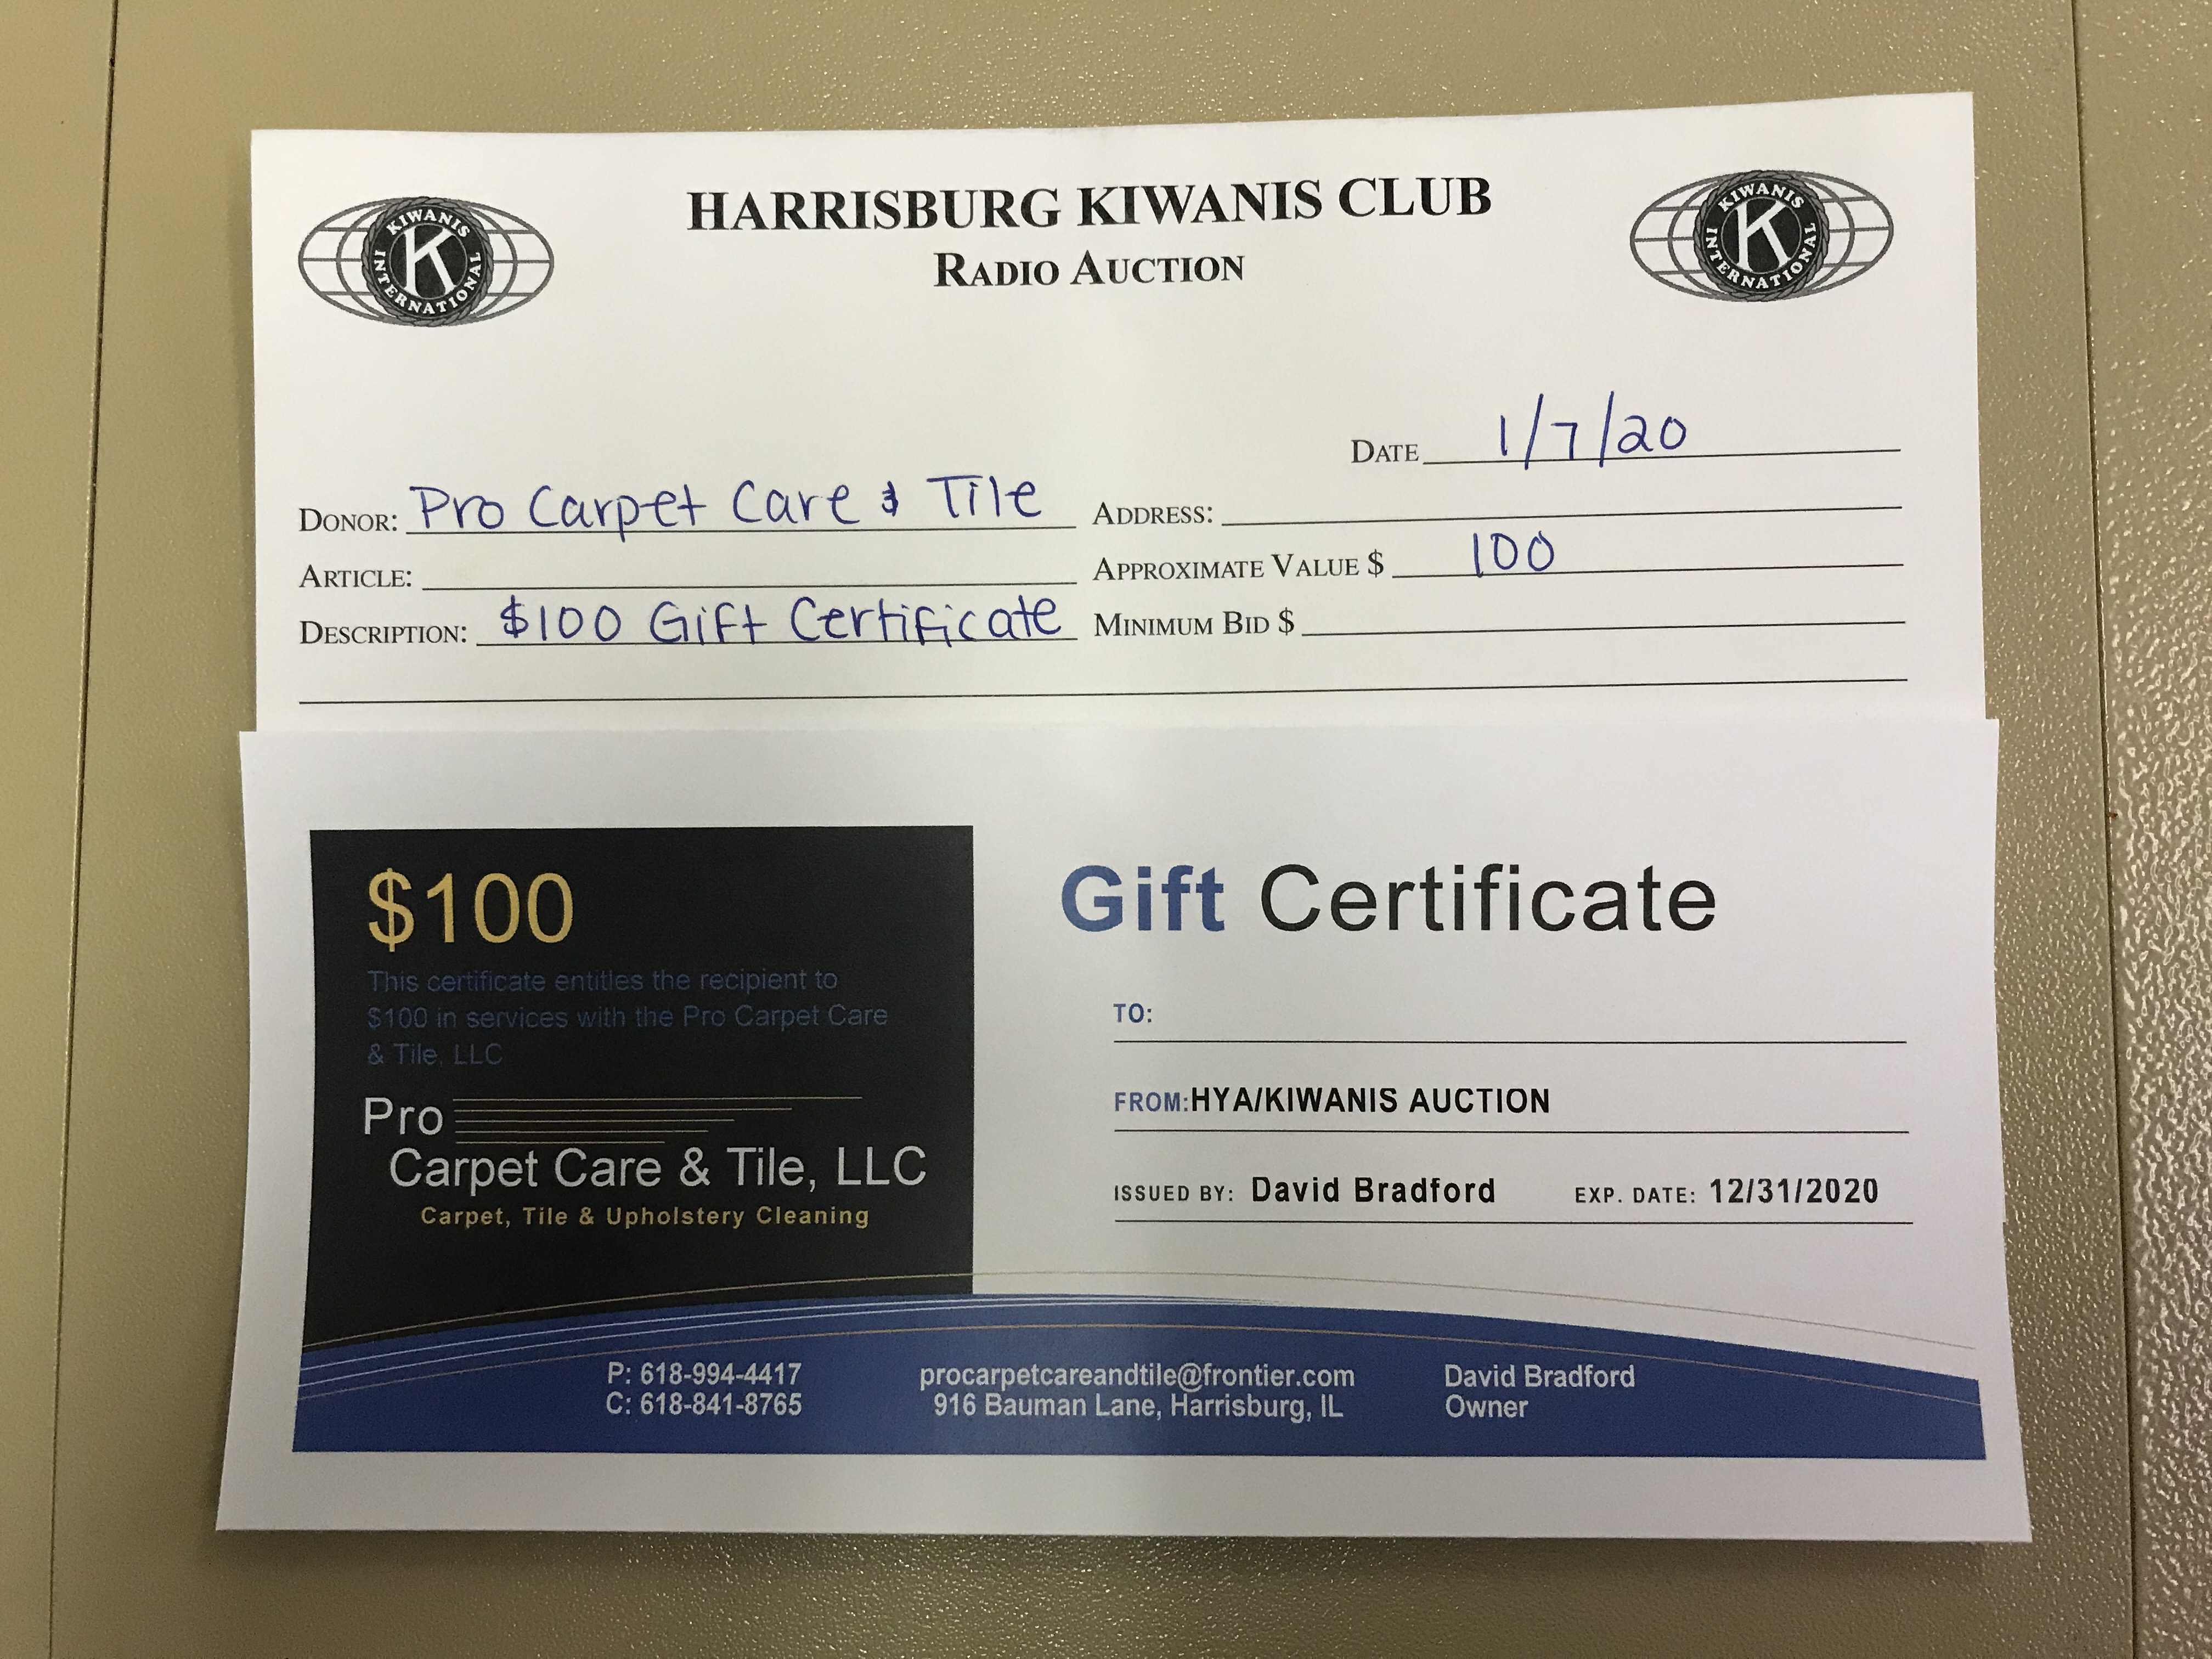 Item 335 - Pro Carpet Care & Tile $100 Gift Certificate